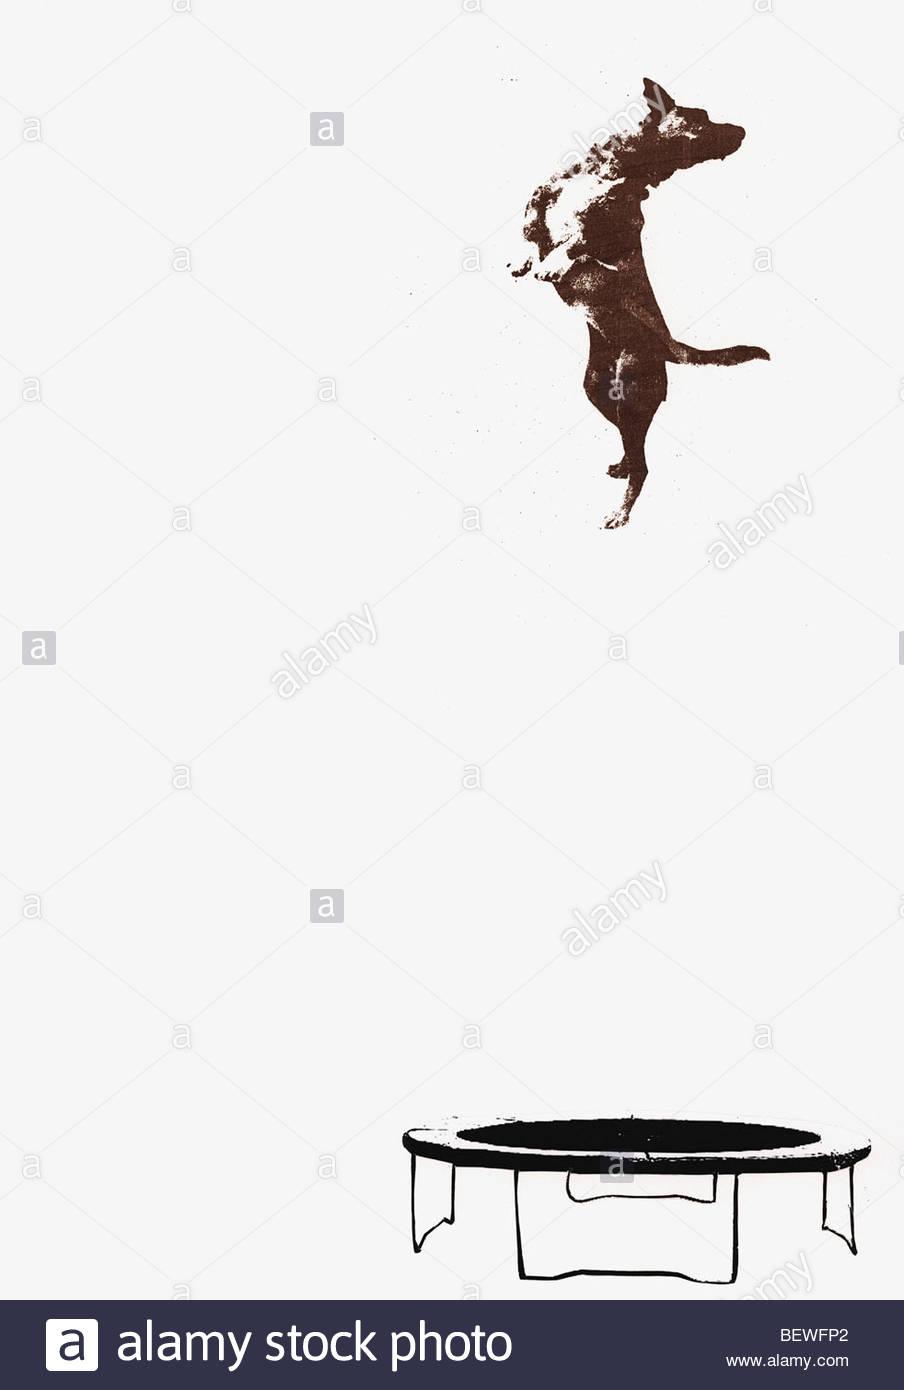 Hund auf Trampolin springen Stockbild